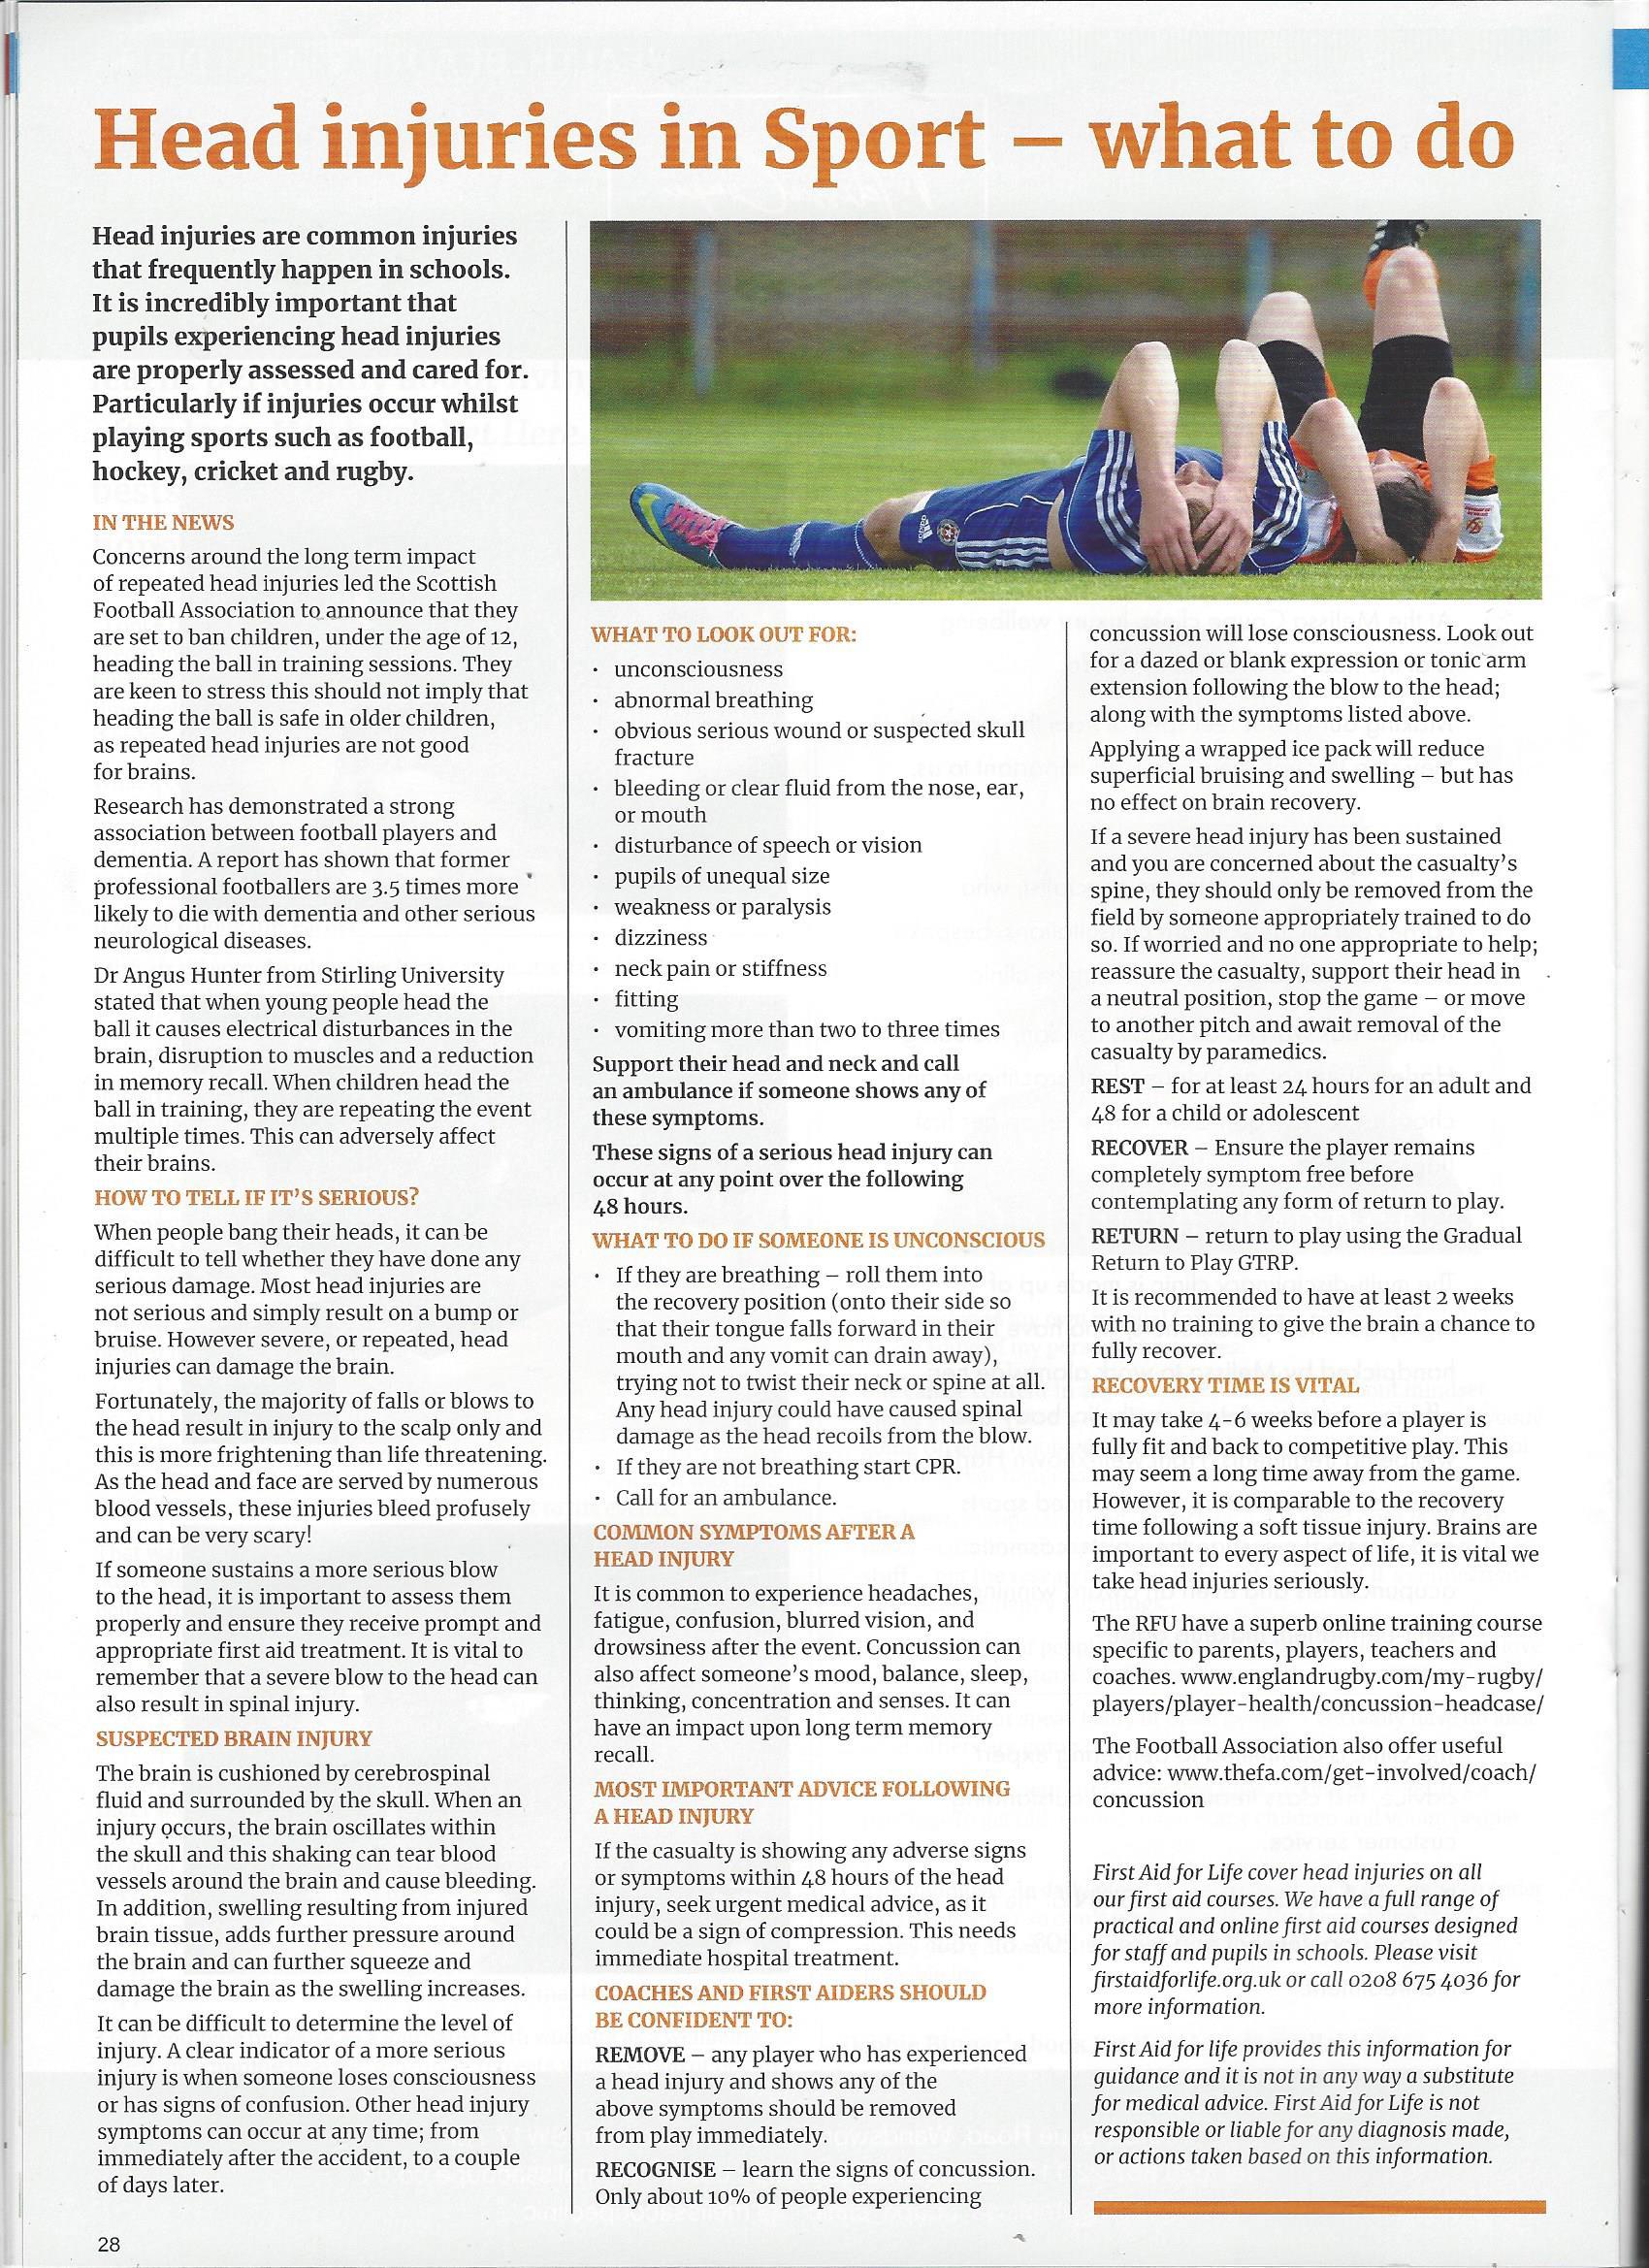 InterSchools Advertiser Head injuries 2020